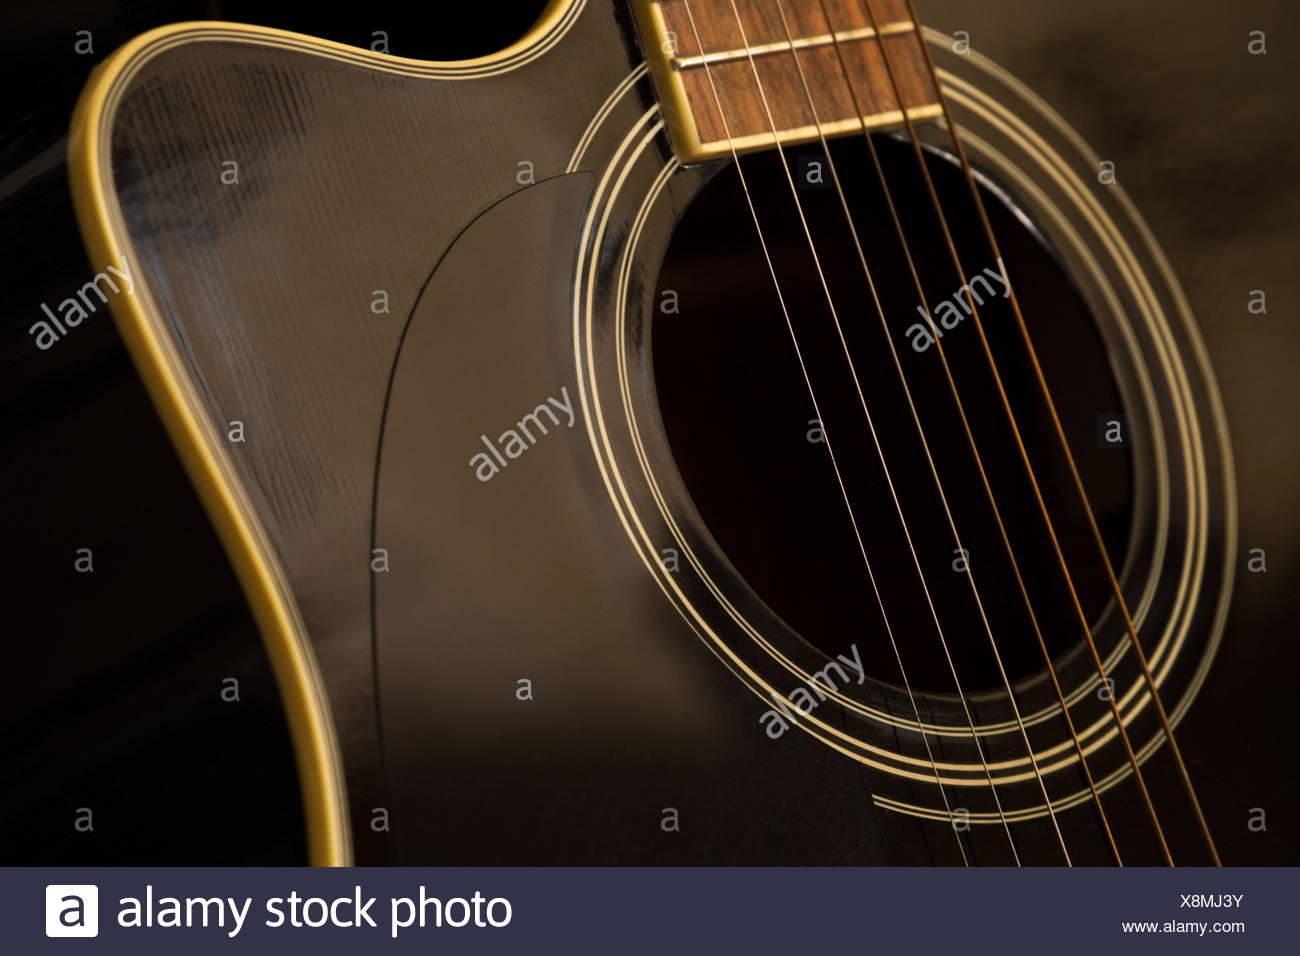 acoustic,acoustic guitar strings,art,artisan,audio